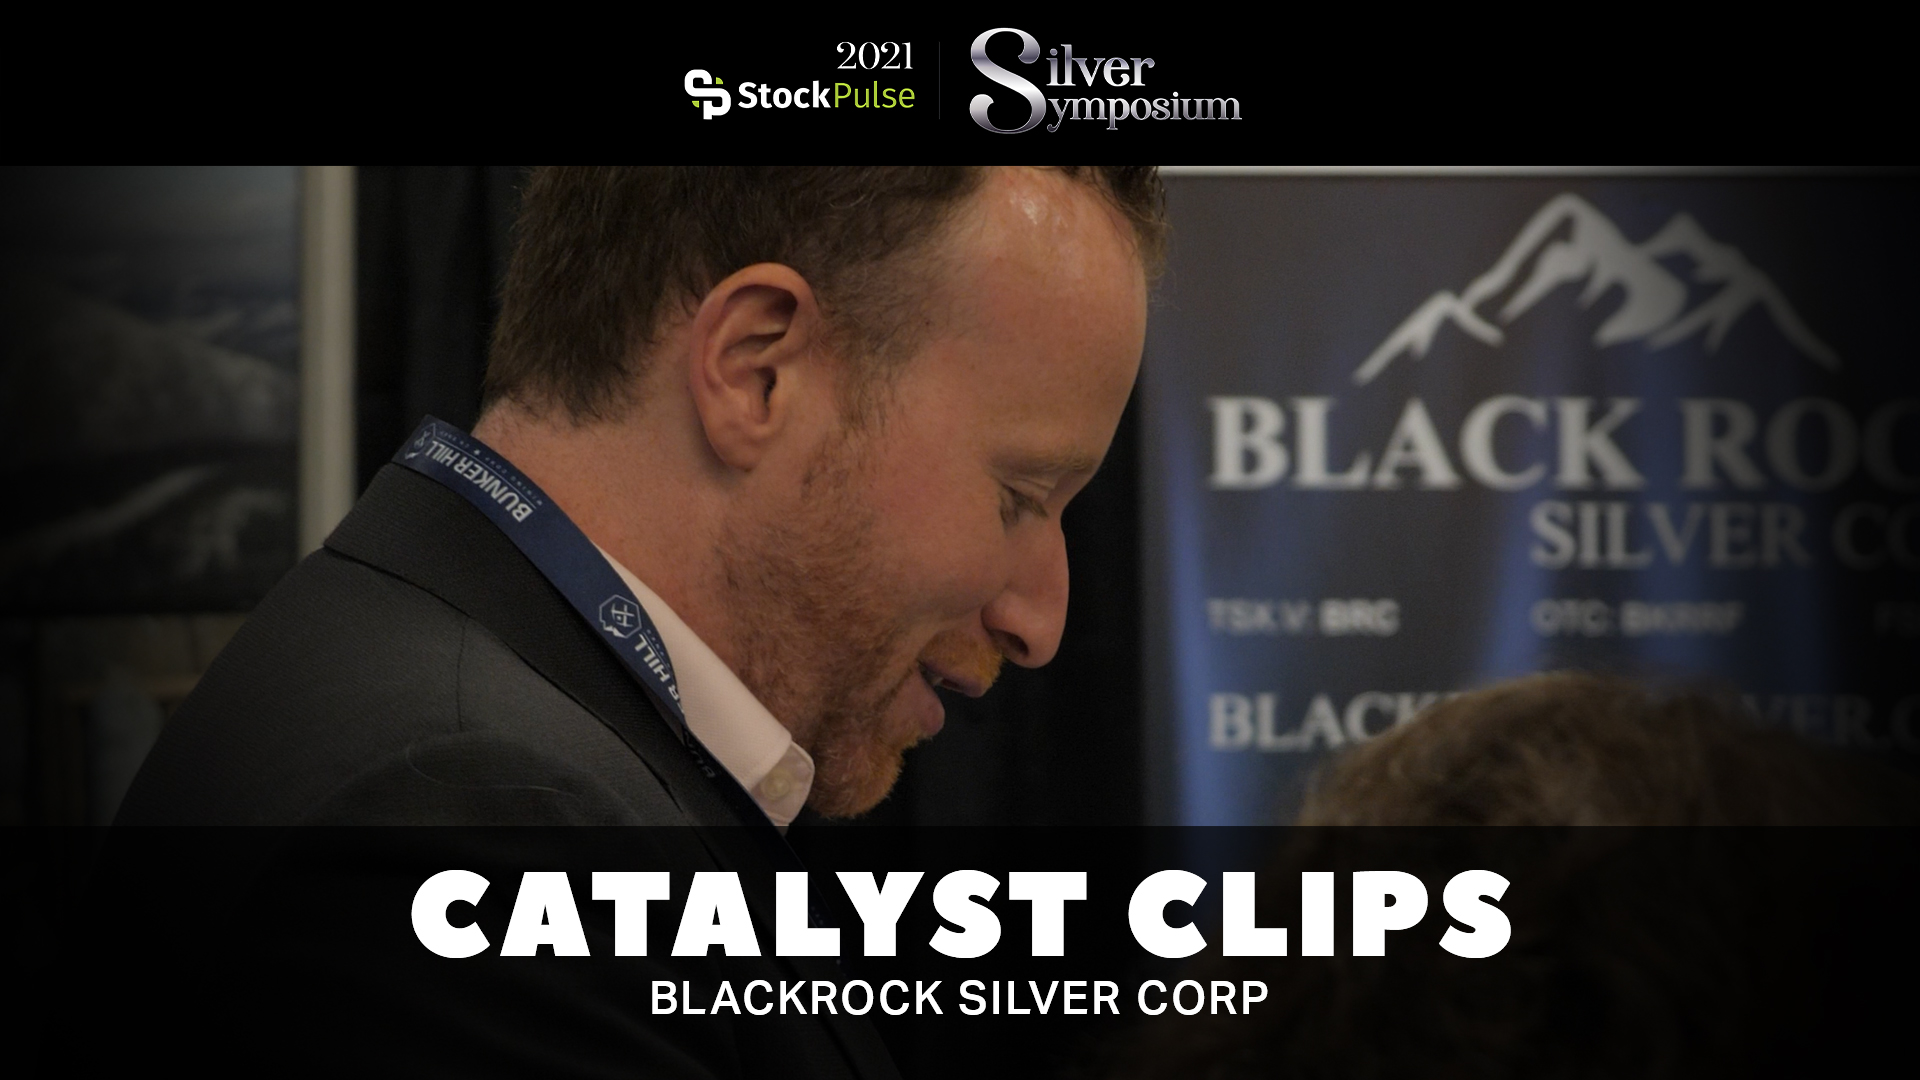 2021 StockPulse Silver Symposium Catalyst Clips | Andrew Pollard of Blackrock Silver Corp